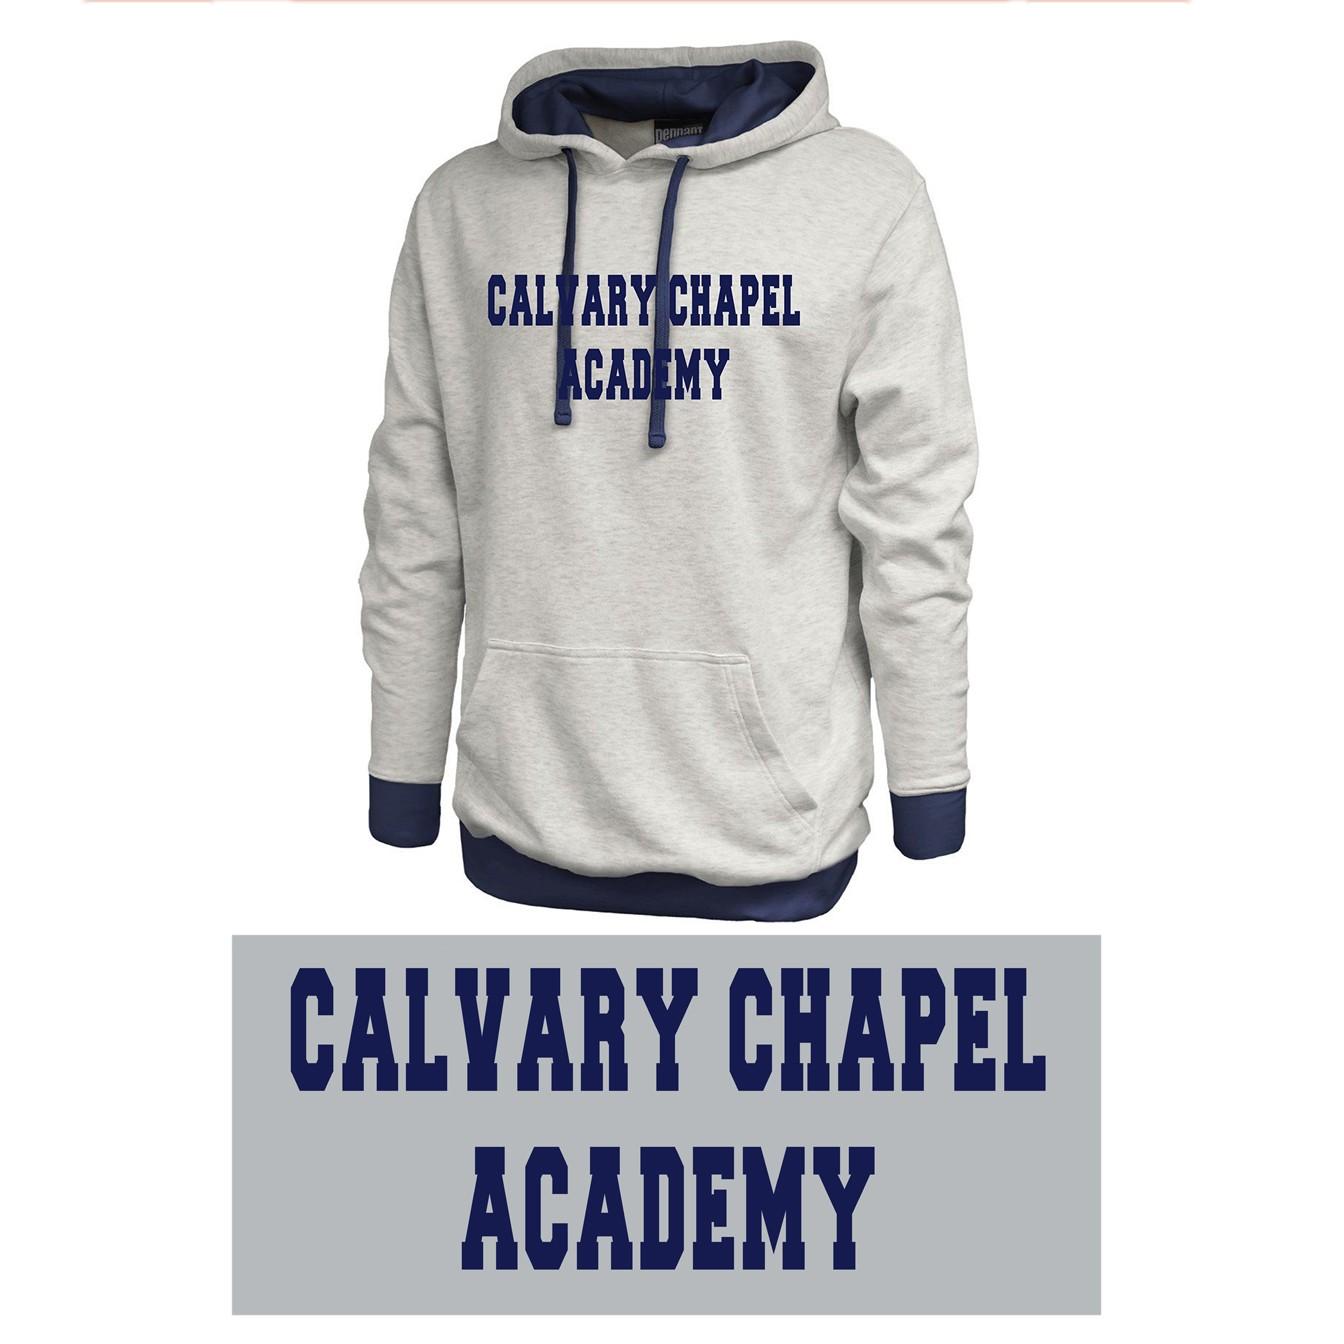 Calvary Chapel Academy Pennant Sportswear Vintage White & Navy Hoodie, Adult Sizing